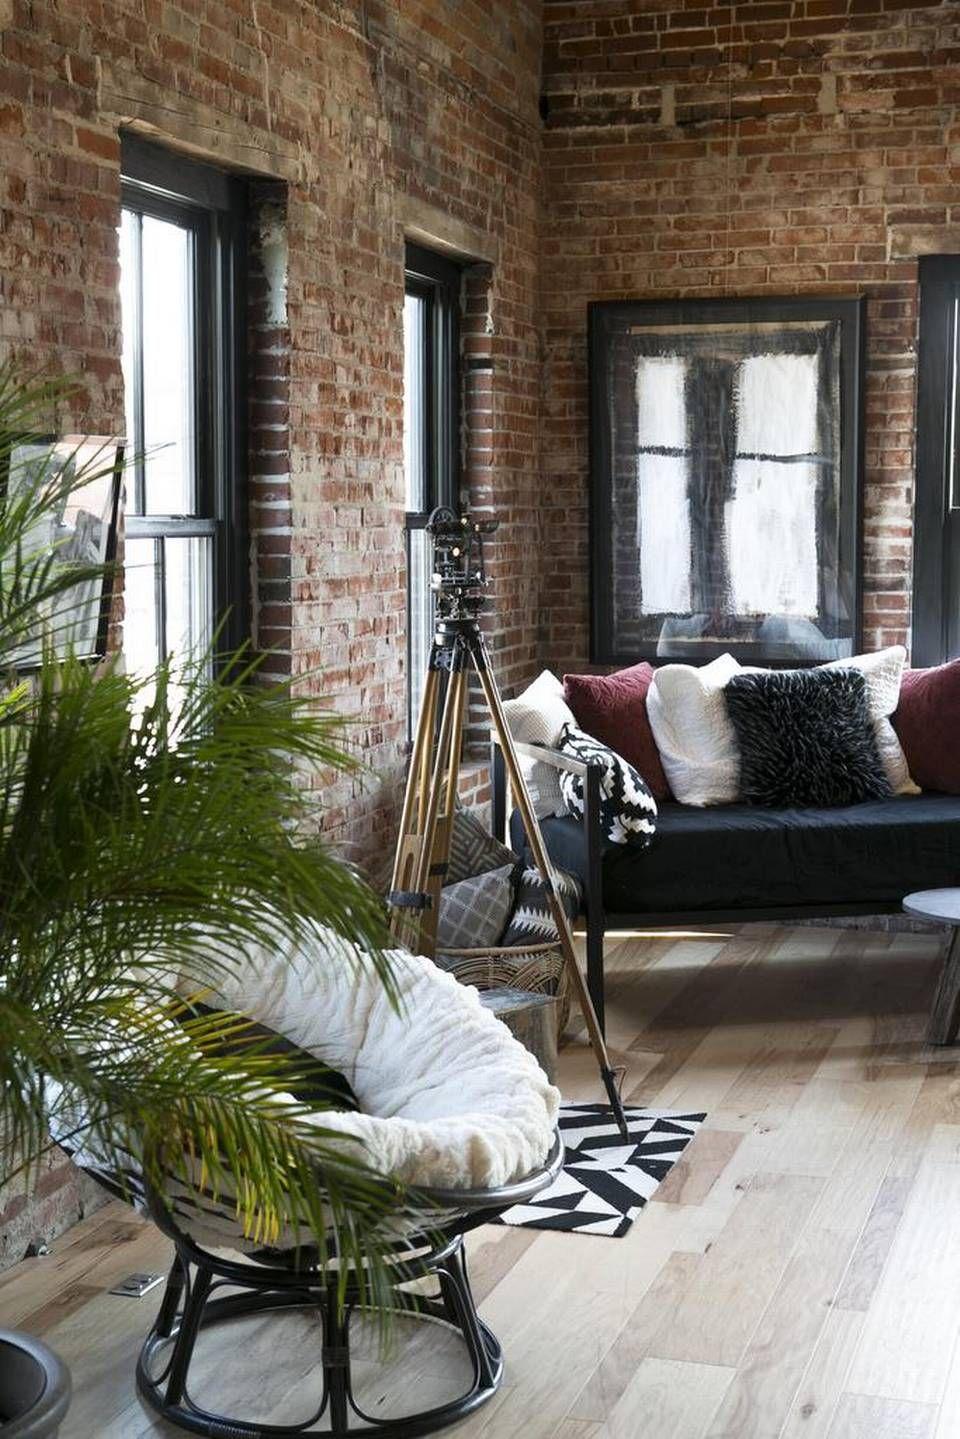 Artist And Designer Creates Urban Loft In Renovated Downtown Edwardsville Building Brick Wall Living Room Exposed Brick Wall Living Room Brick Interior